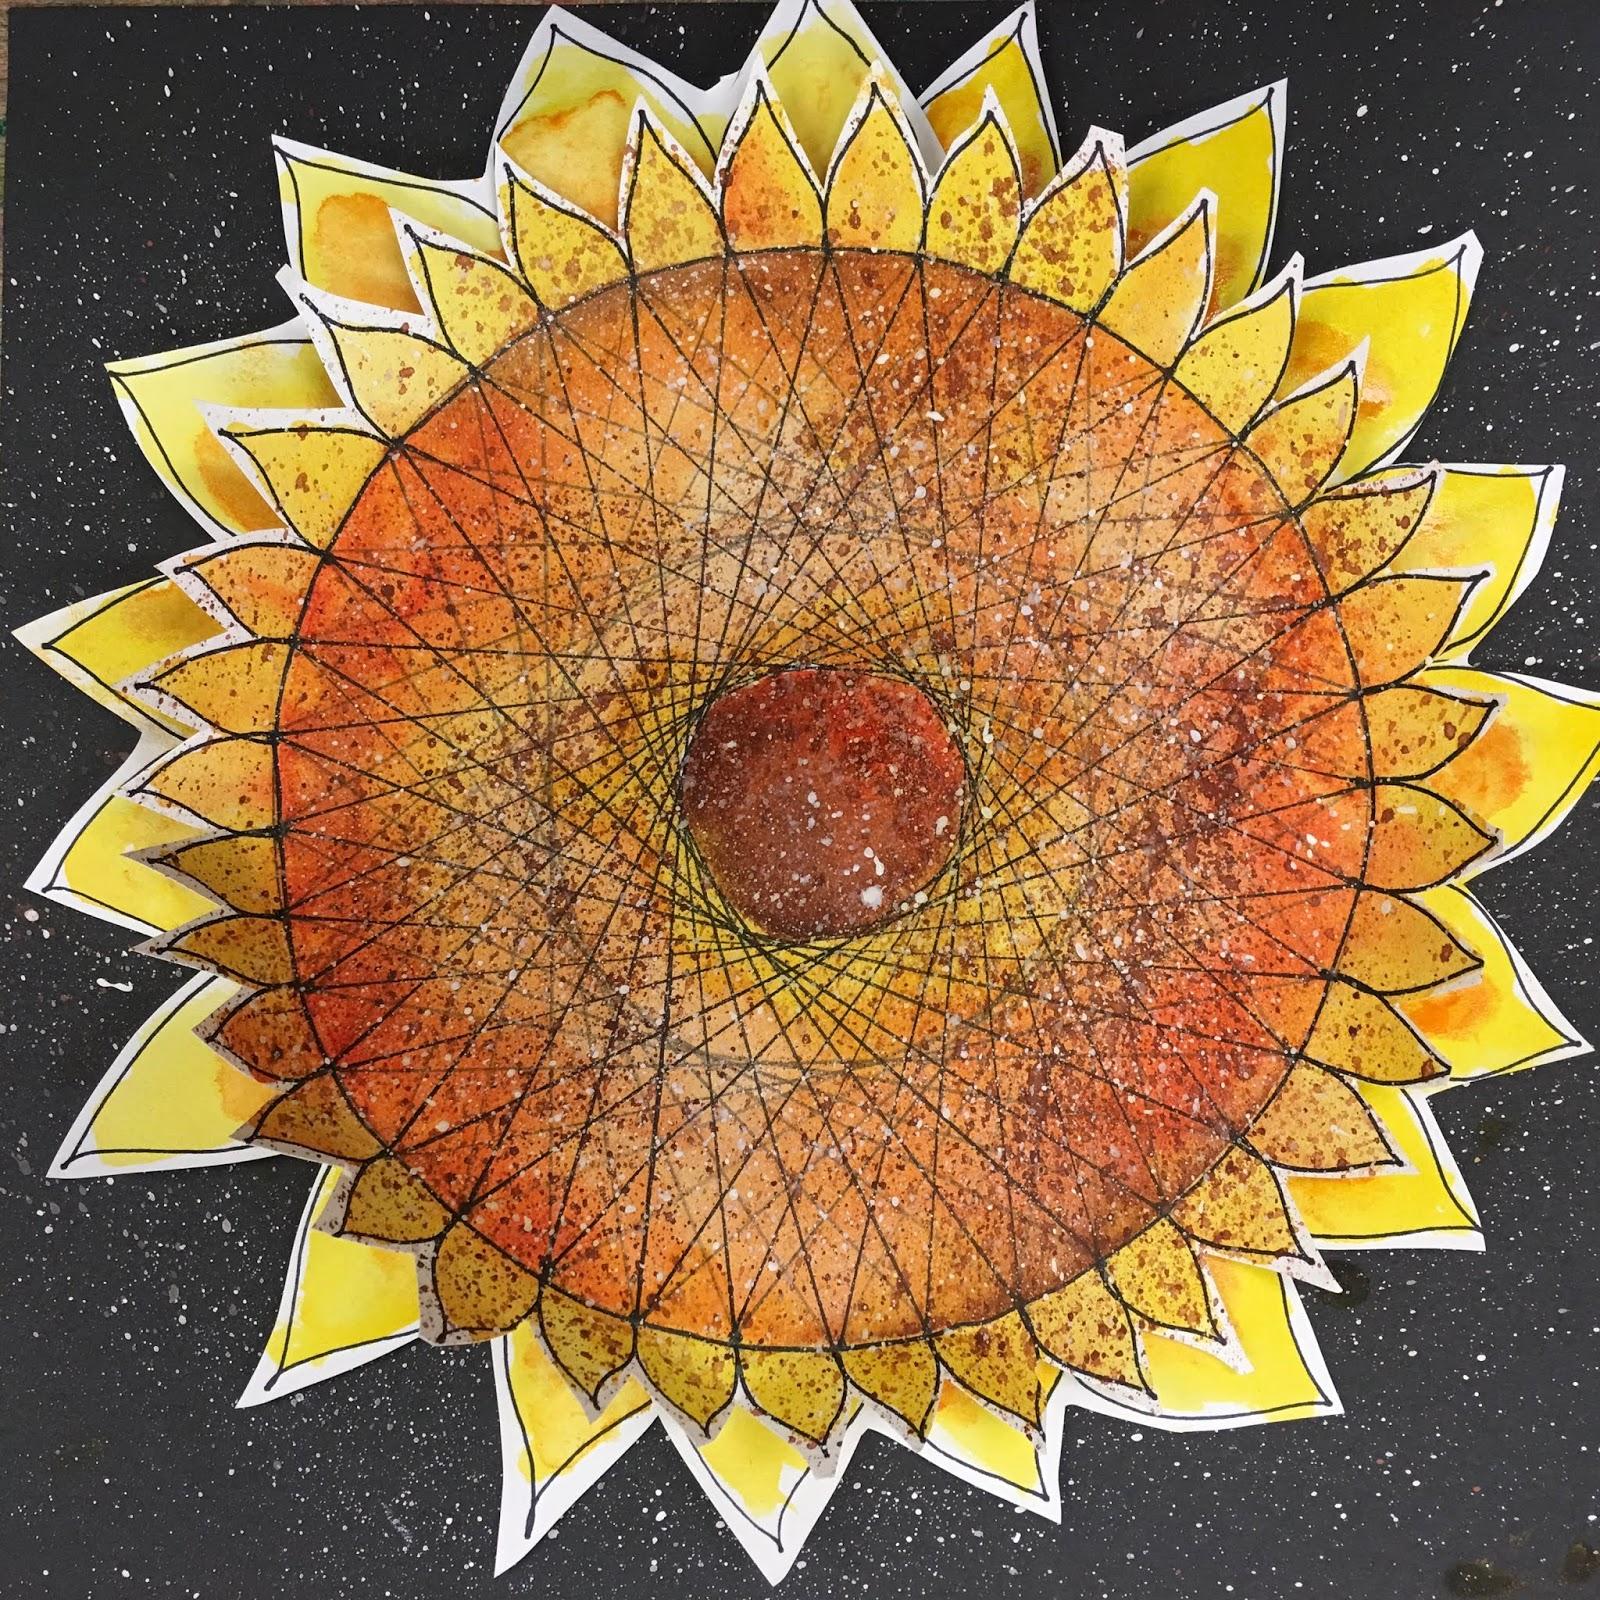 Art Room Blog Parabolic Curve Sunflowers